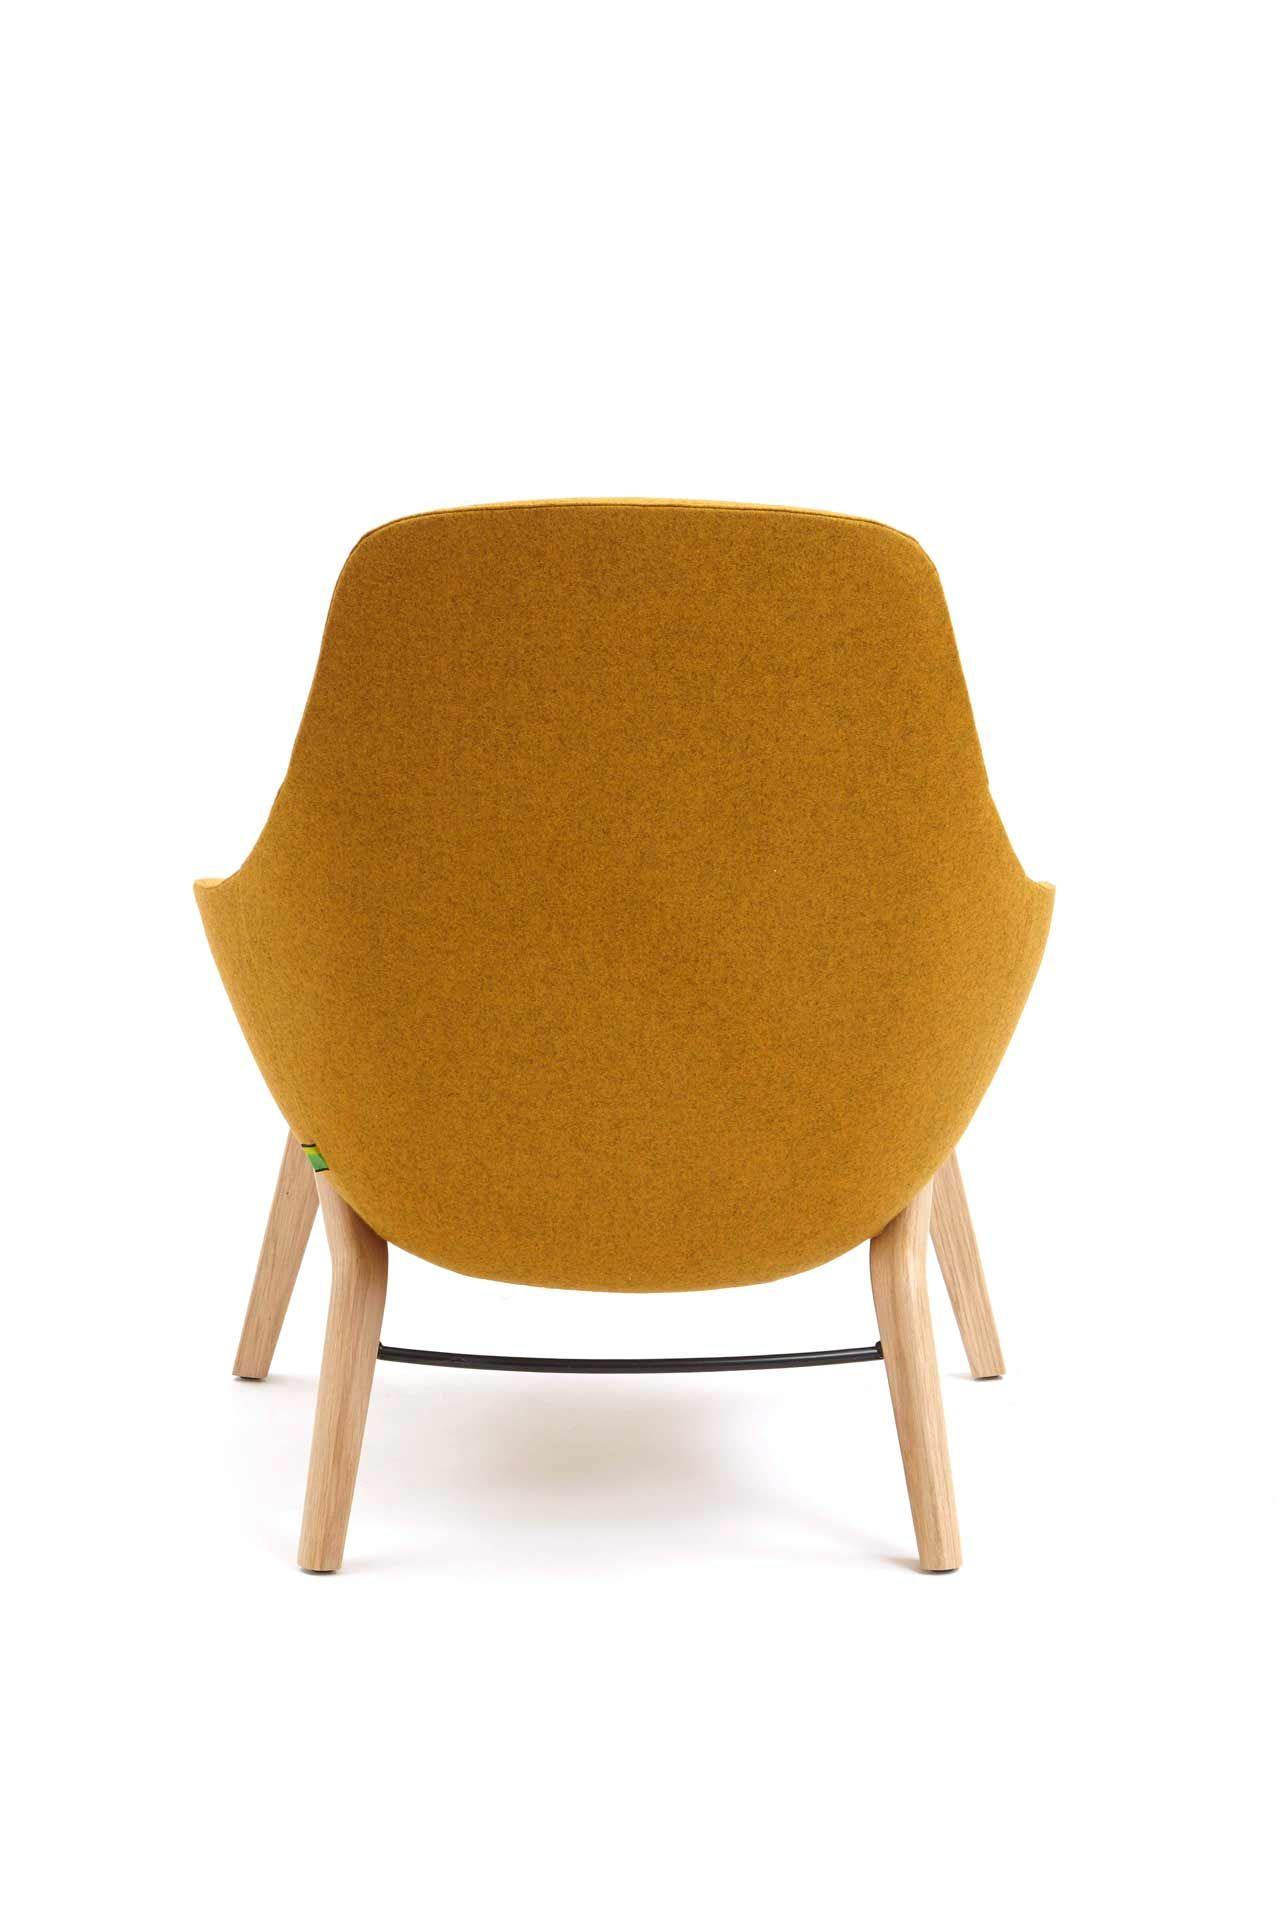 Chair Design Portfolio Indoor Lounge Covers Naughtone Always